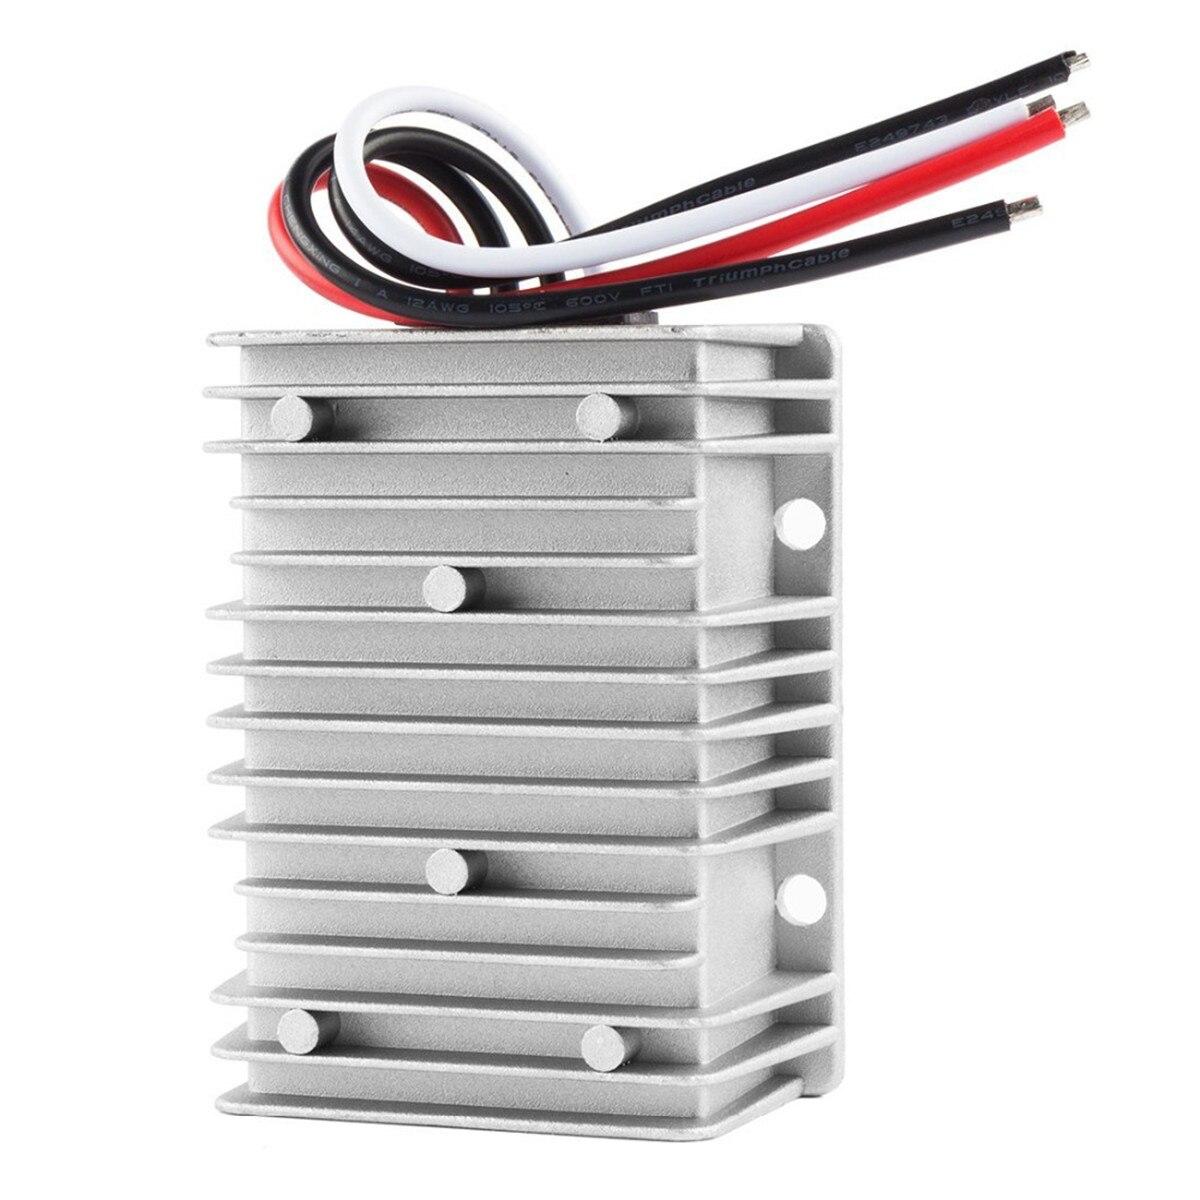 Power Regulator DC 24V to 12V 40A 480W Waterproof Car Supply Voltage Converter Module Board Inverters Converters<br>